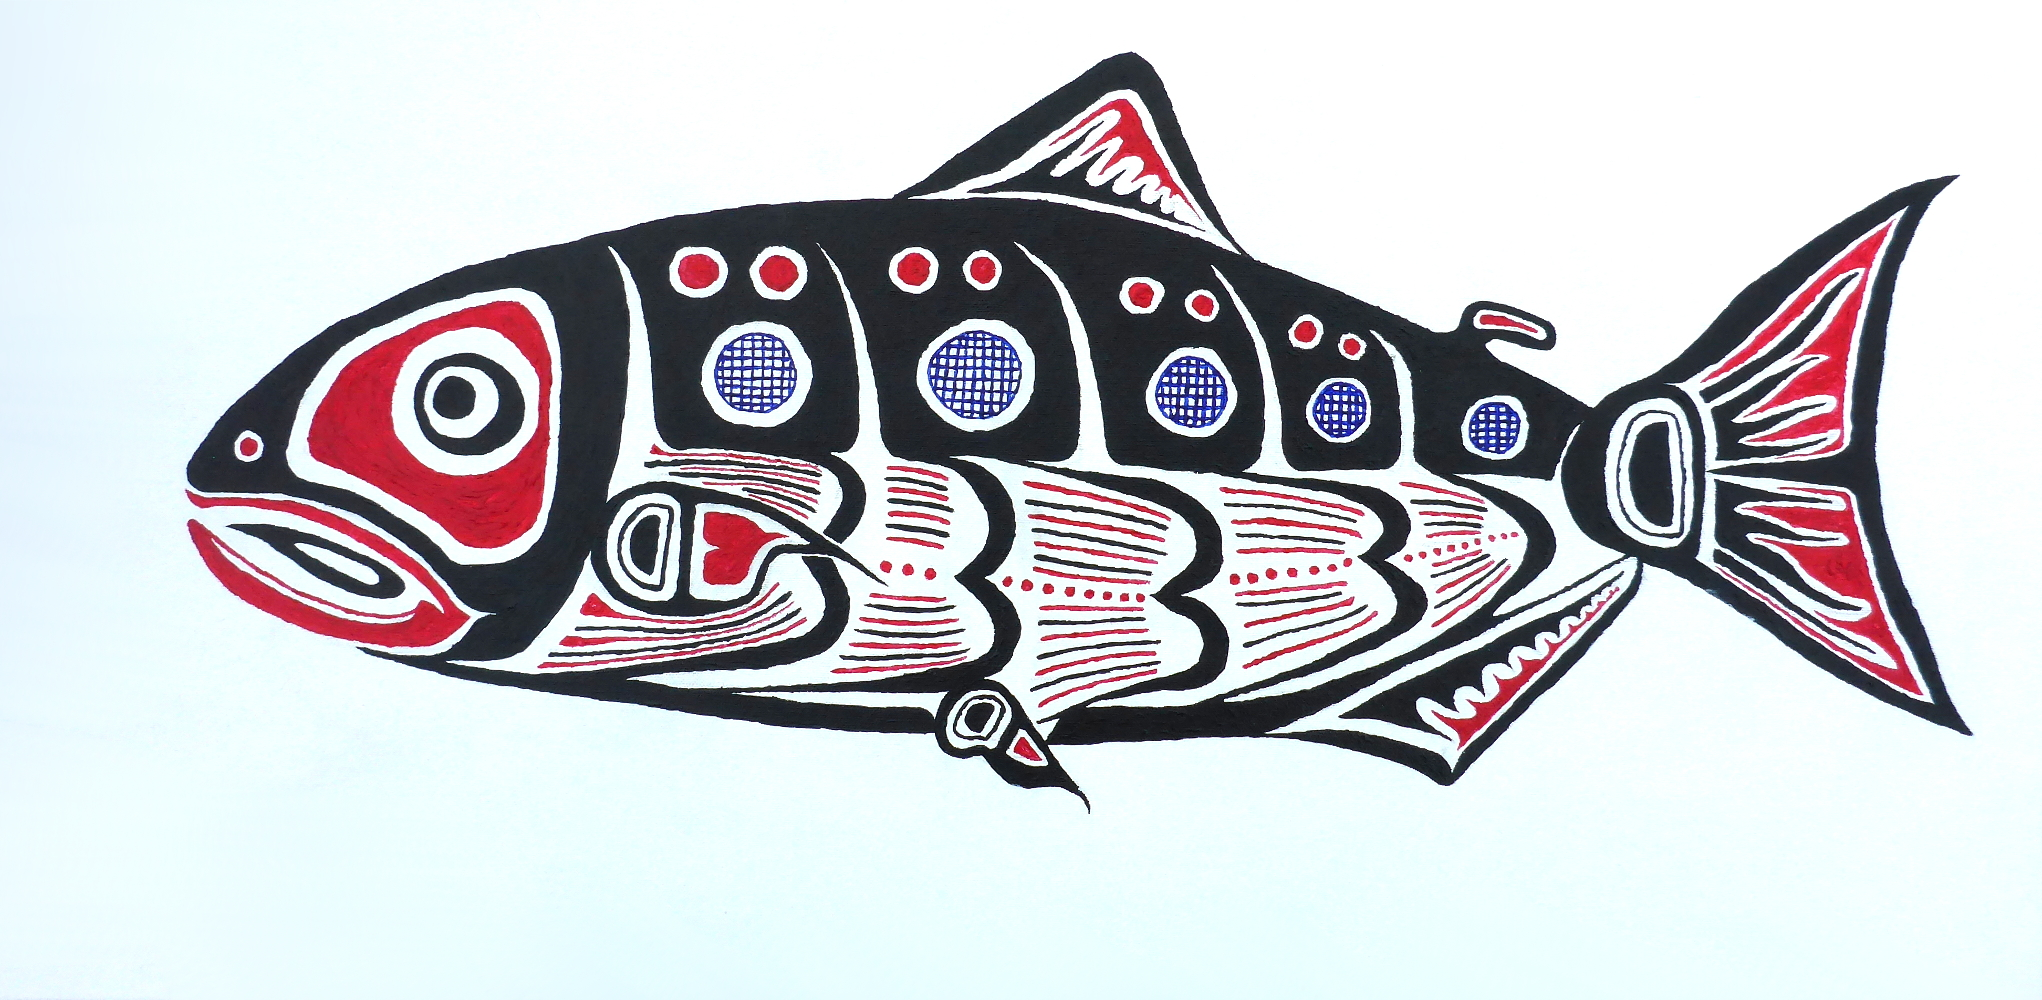 """Lachs"", 2018, Acryl auf Leinwand, 80 x 40 cm"